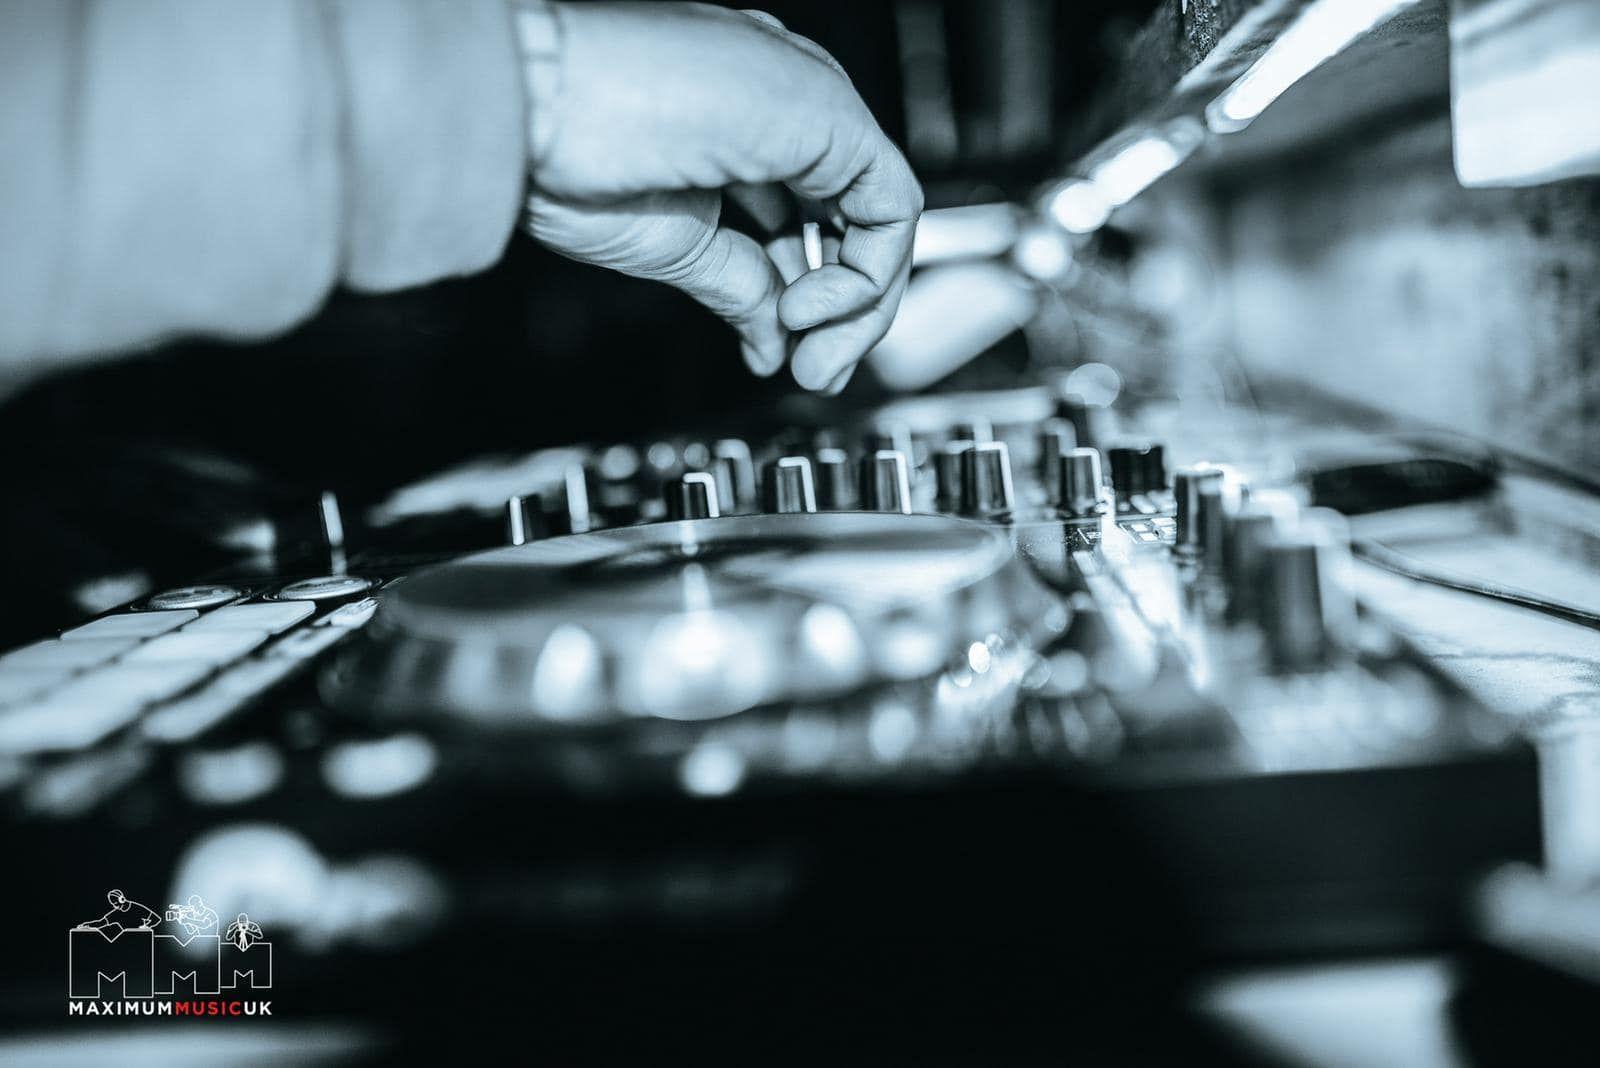 DJs in Manchester